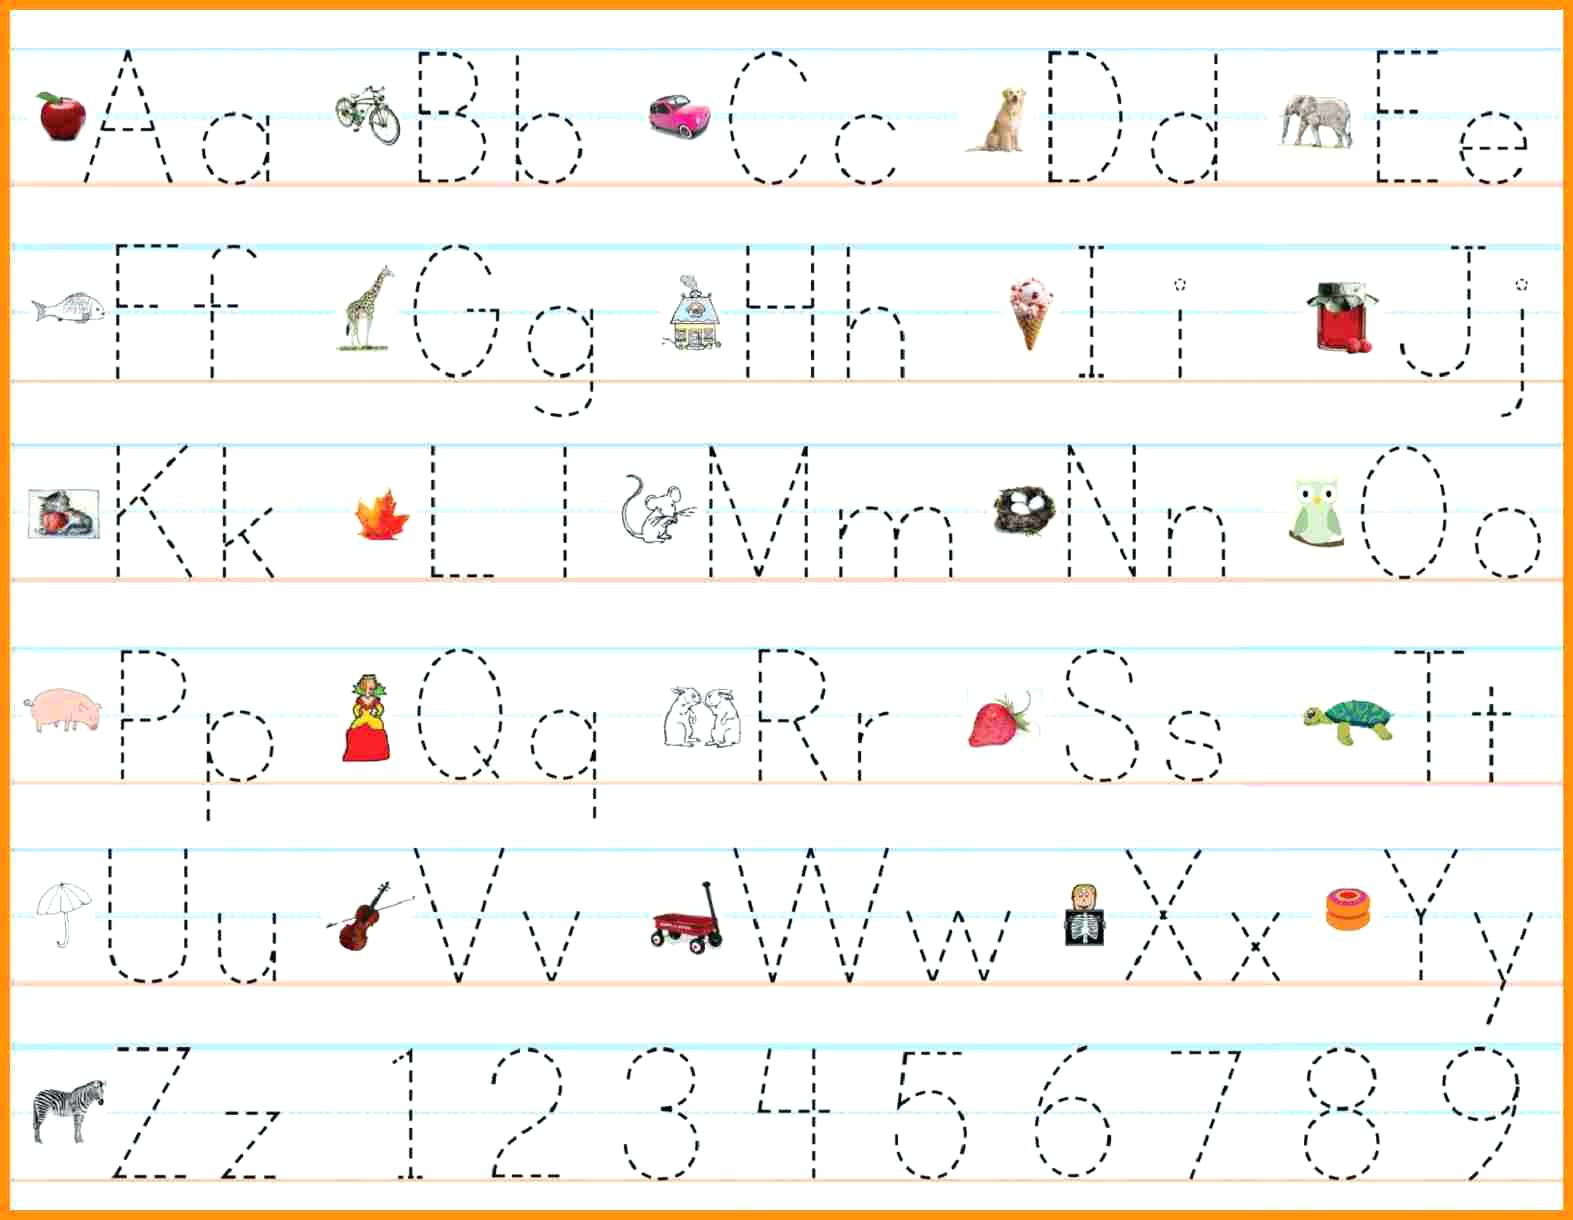 Alphabet Worksheets Pdf Free - Clover Hatunisi with regard to Alphabet Handwriting Worksheets Pdf